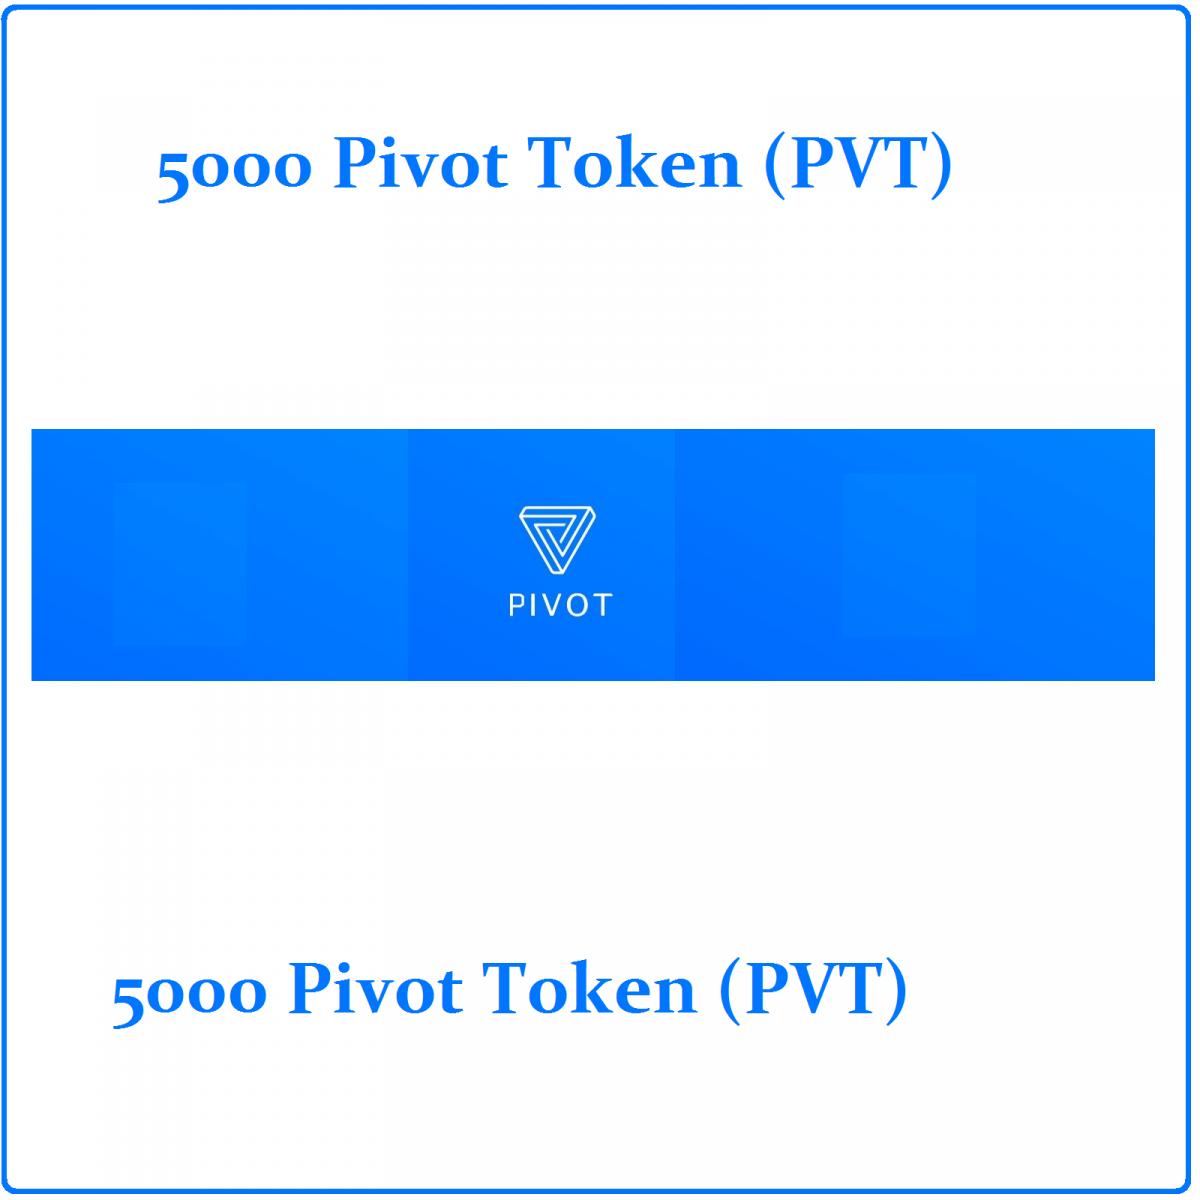 5000 Pivot token (PVT) Mining Contract